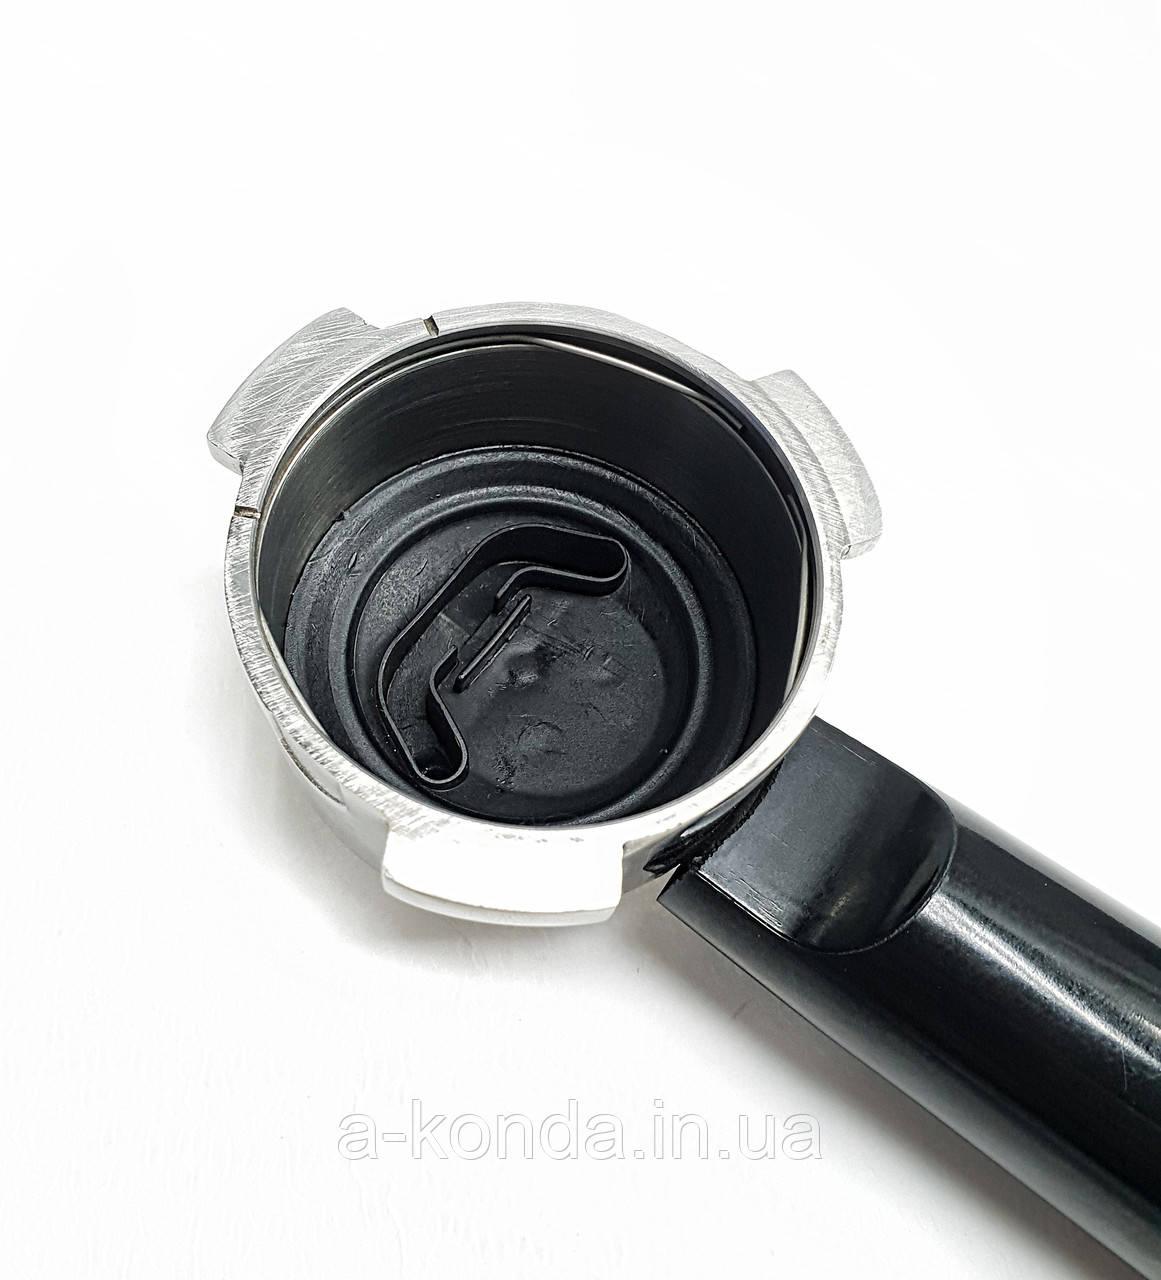 Рожок (холдер) для кофеварки Zelmer  13z013